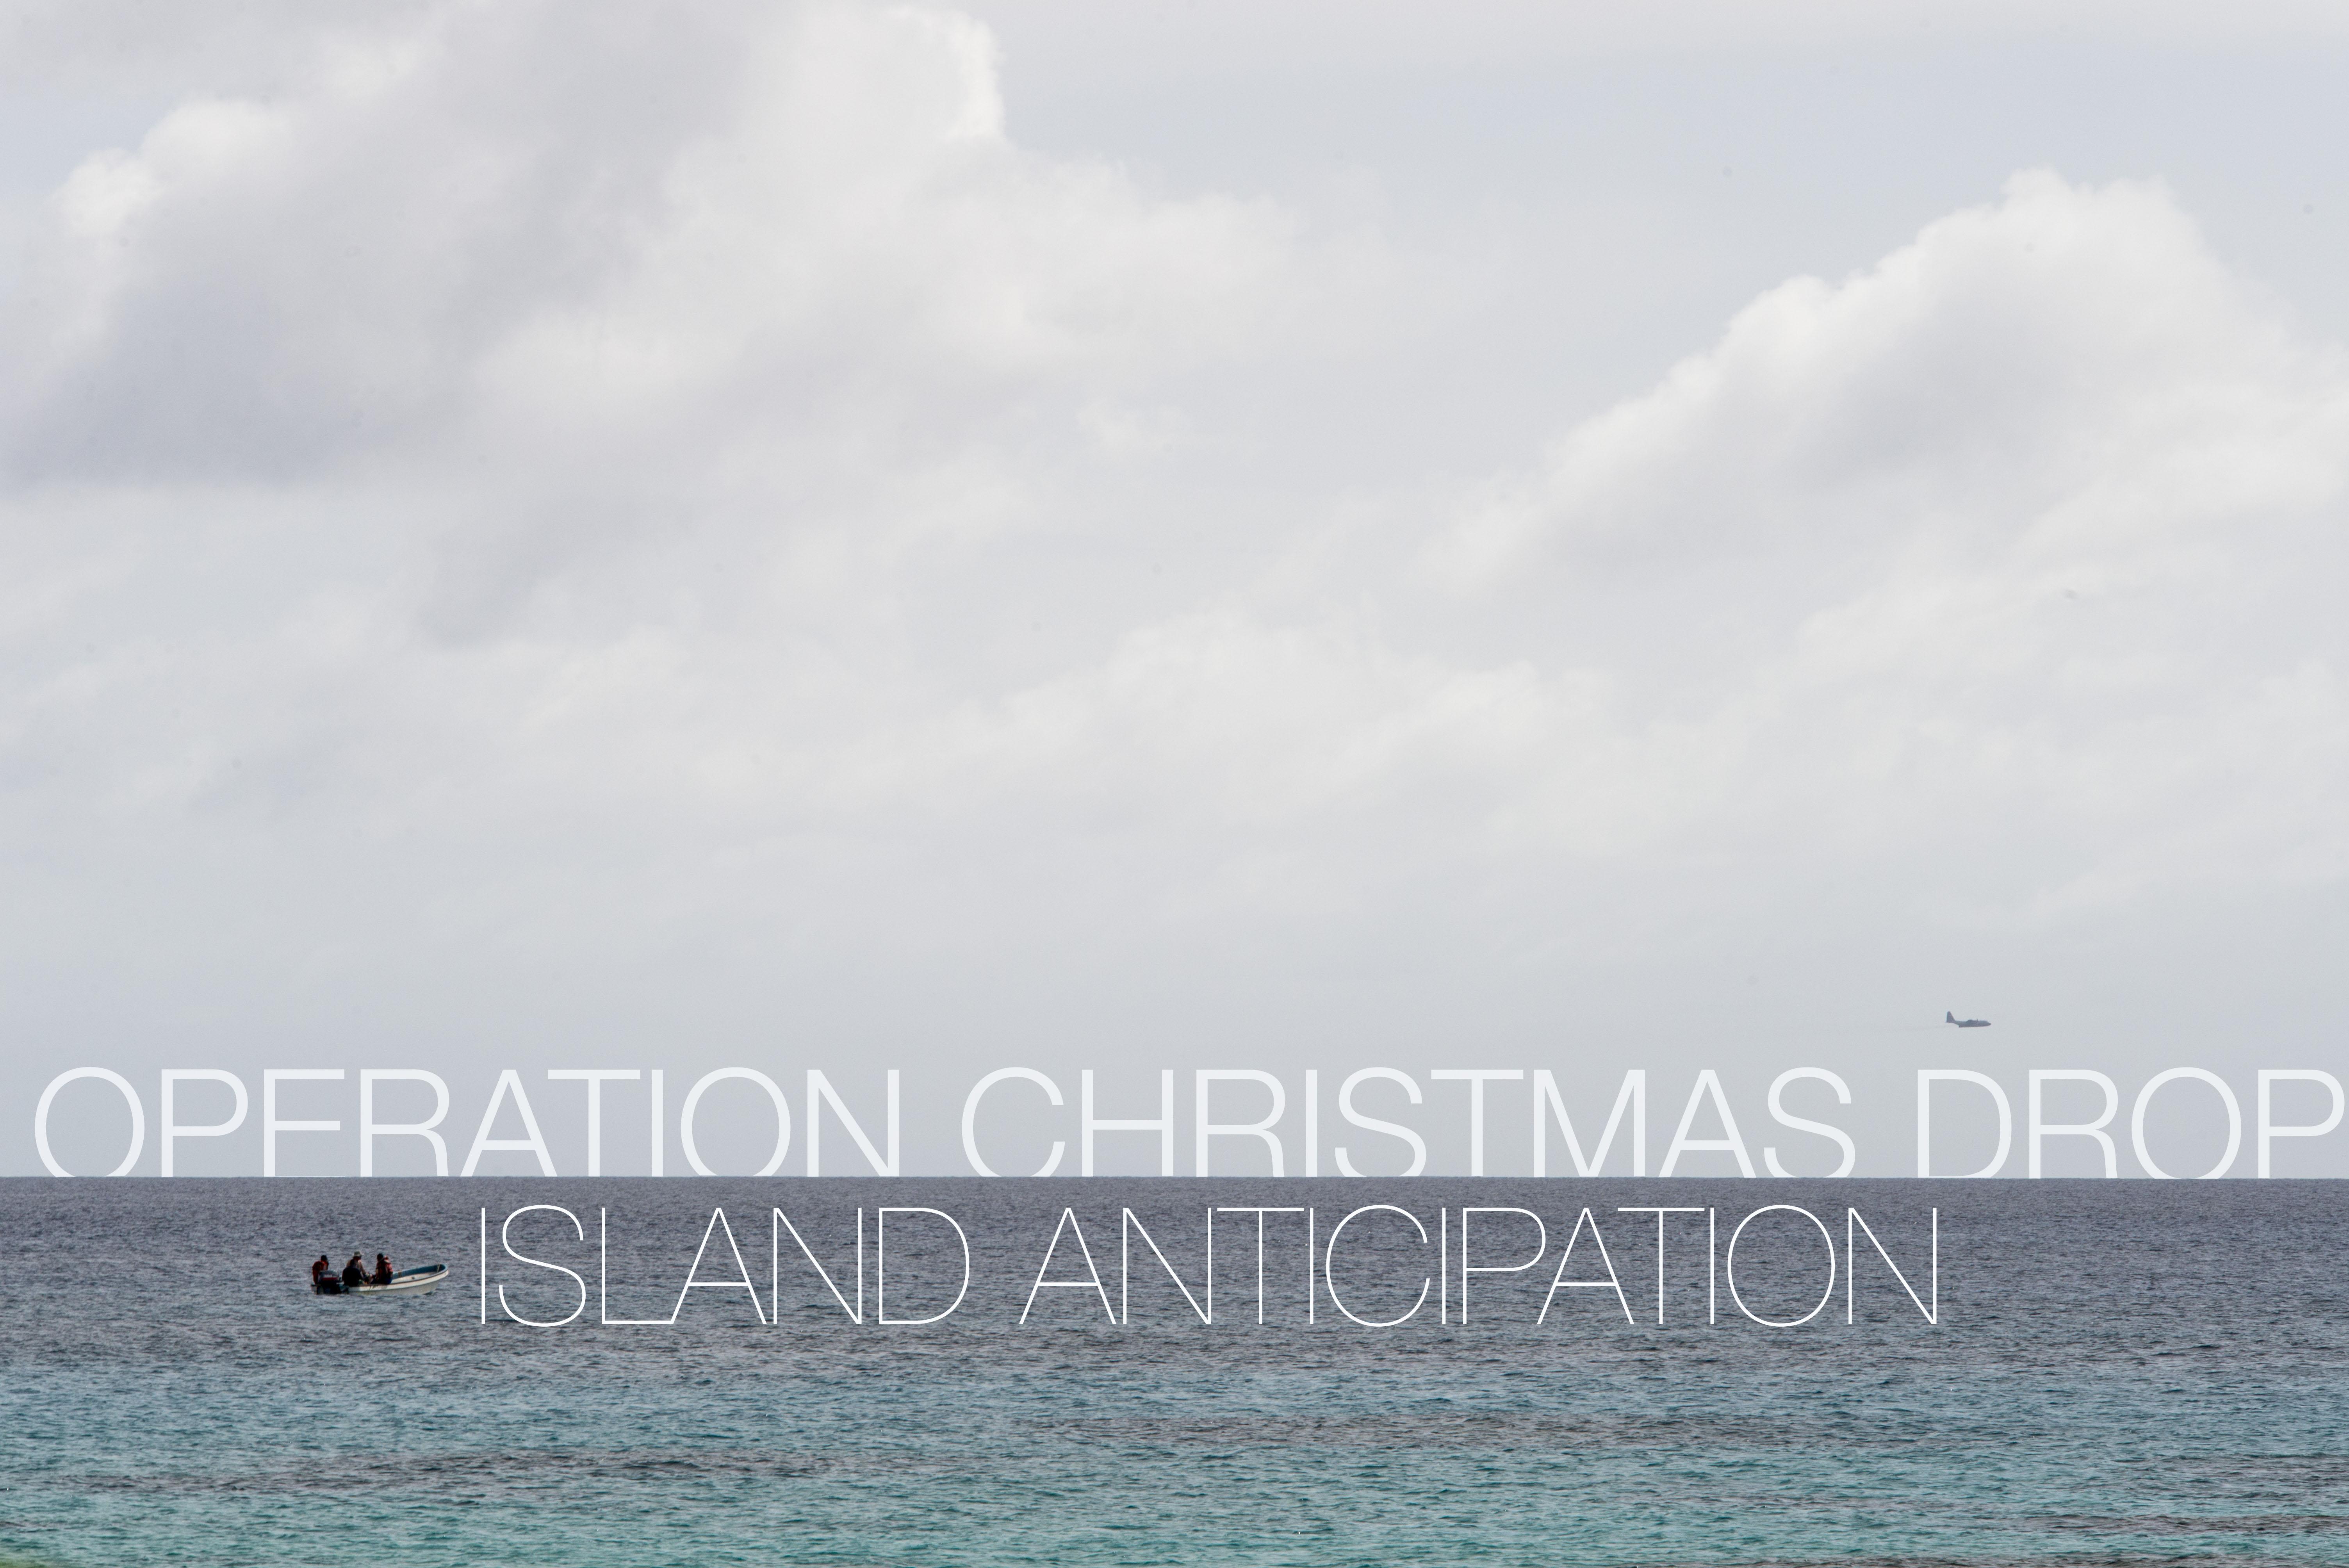 Operation Christmas Drop brings holiday cheer to islanders > Pacific ...